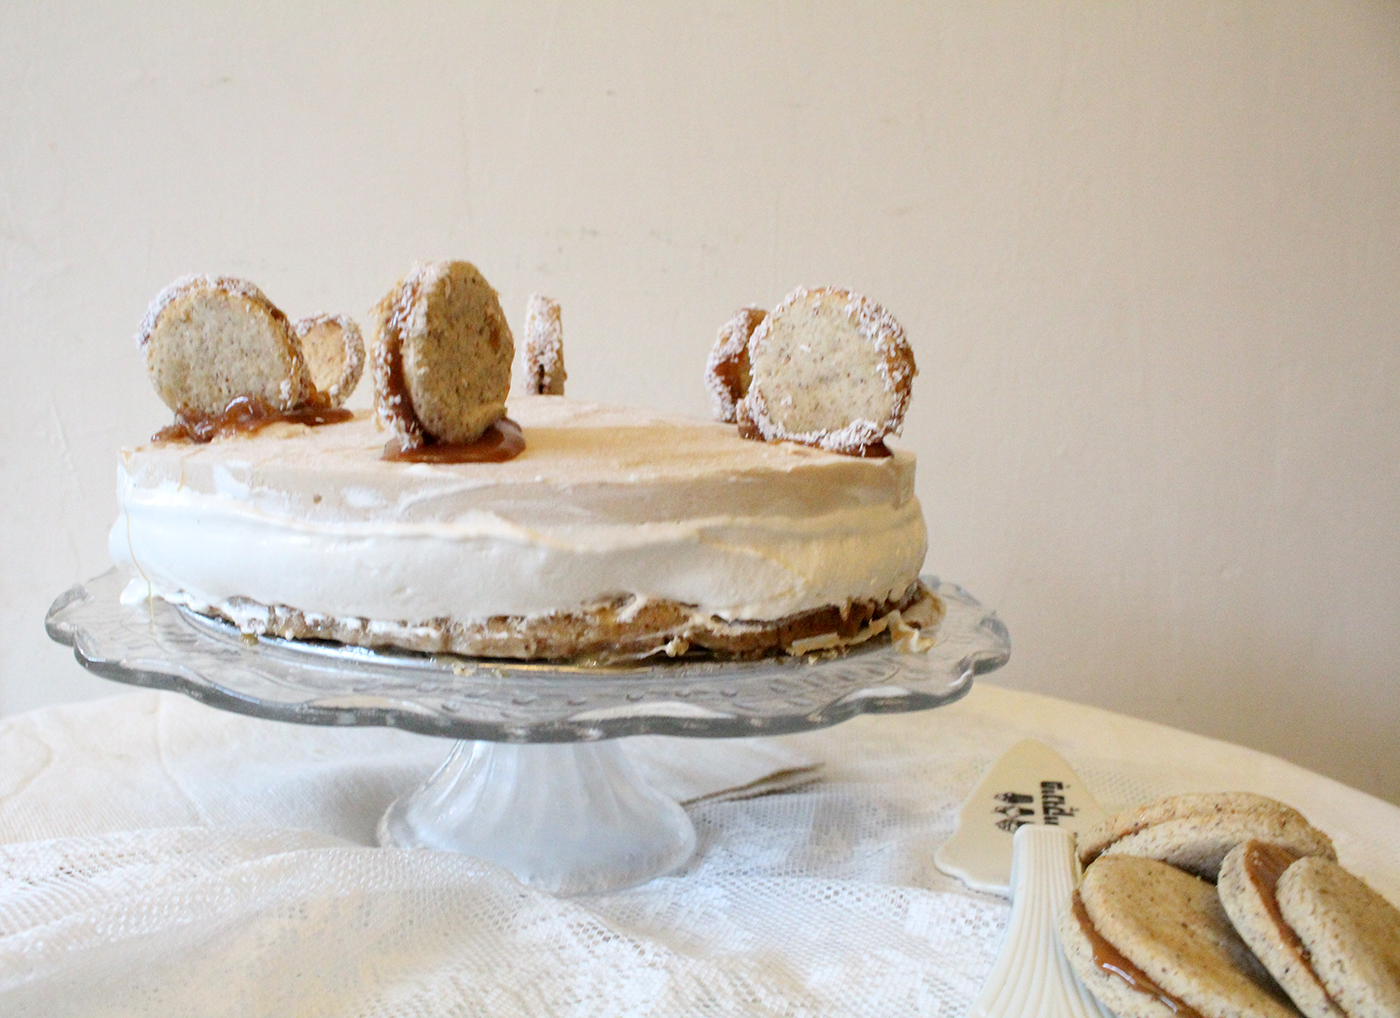 IMG 7788 - עוגת מוס על בסיס אלפחורס